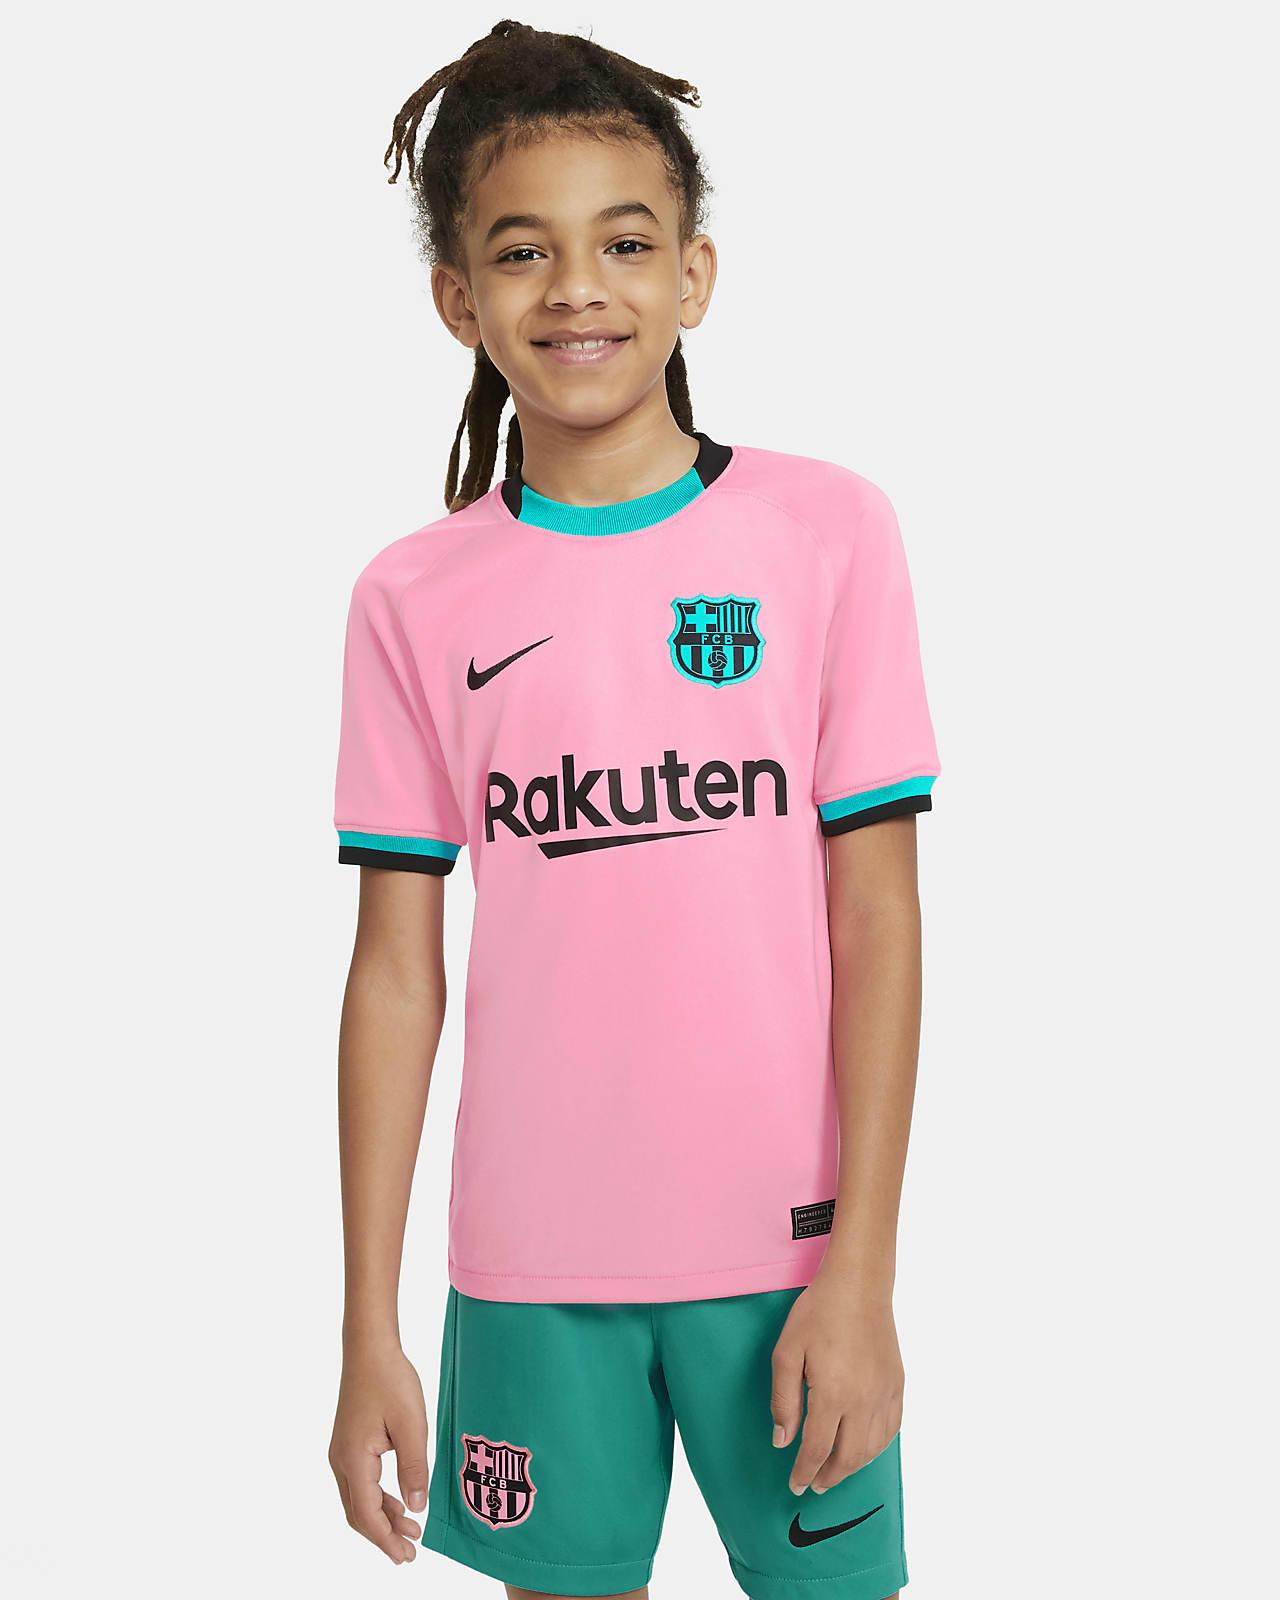 camiseta de futbol alternativa para ninos talla grande stadium fc barcelona 2020 21 nike com camiseta de futbol alternativa para ninos talla grande stadium fc barcelona 2020 21